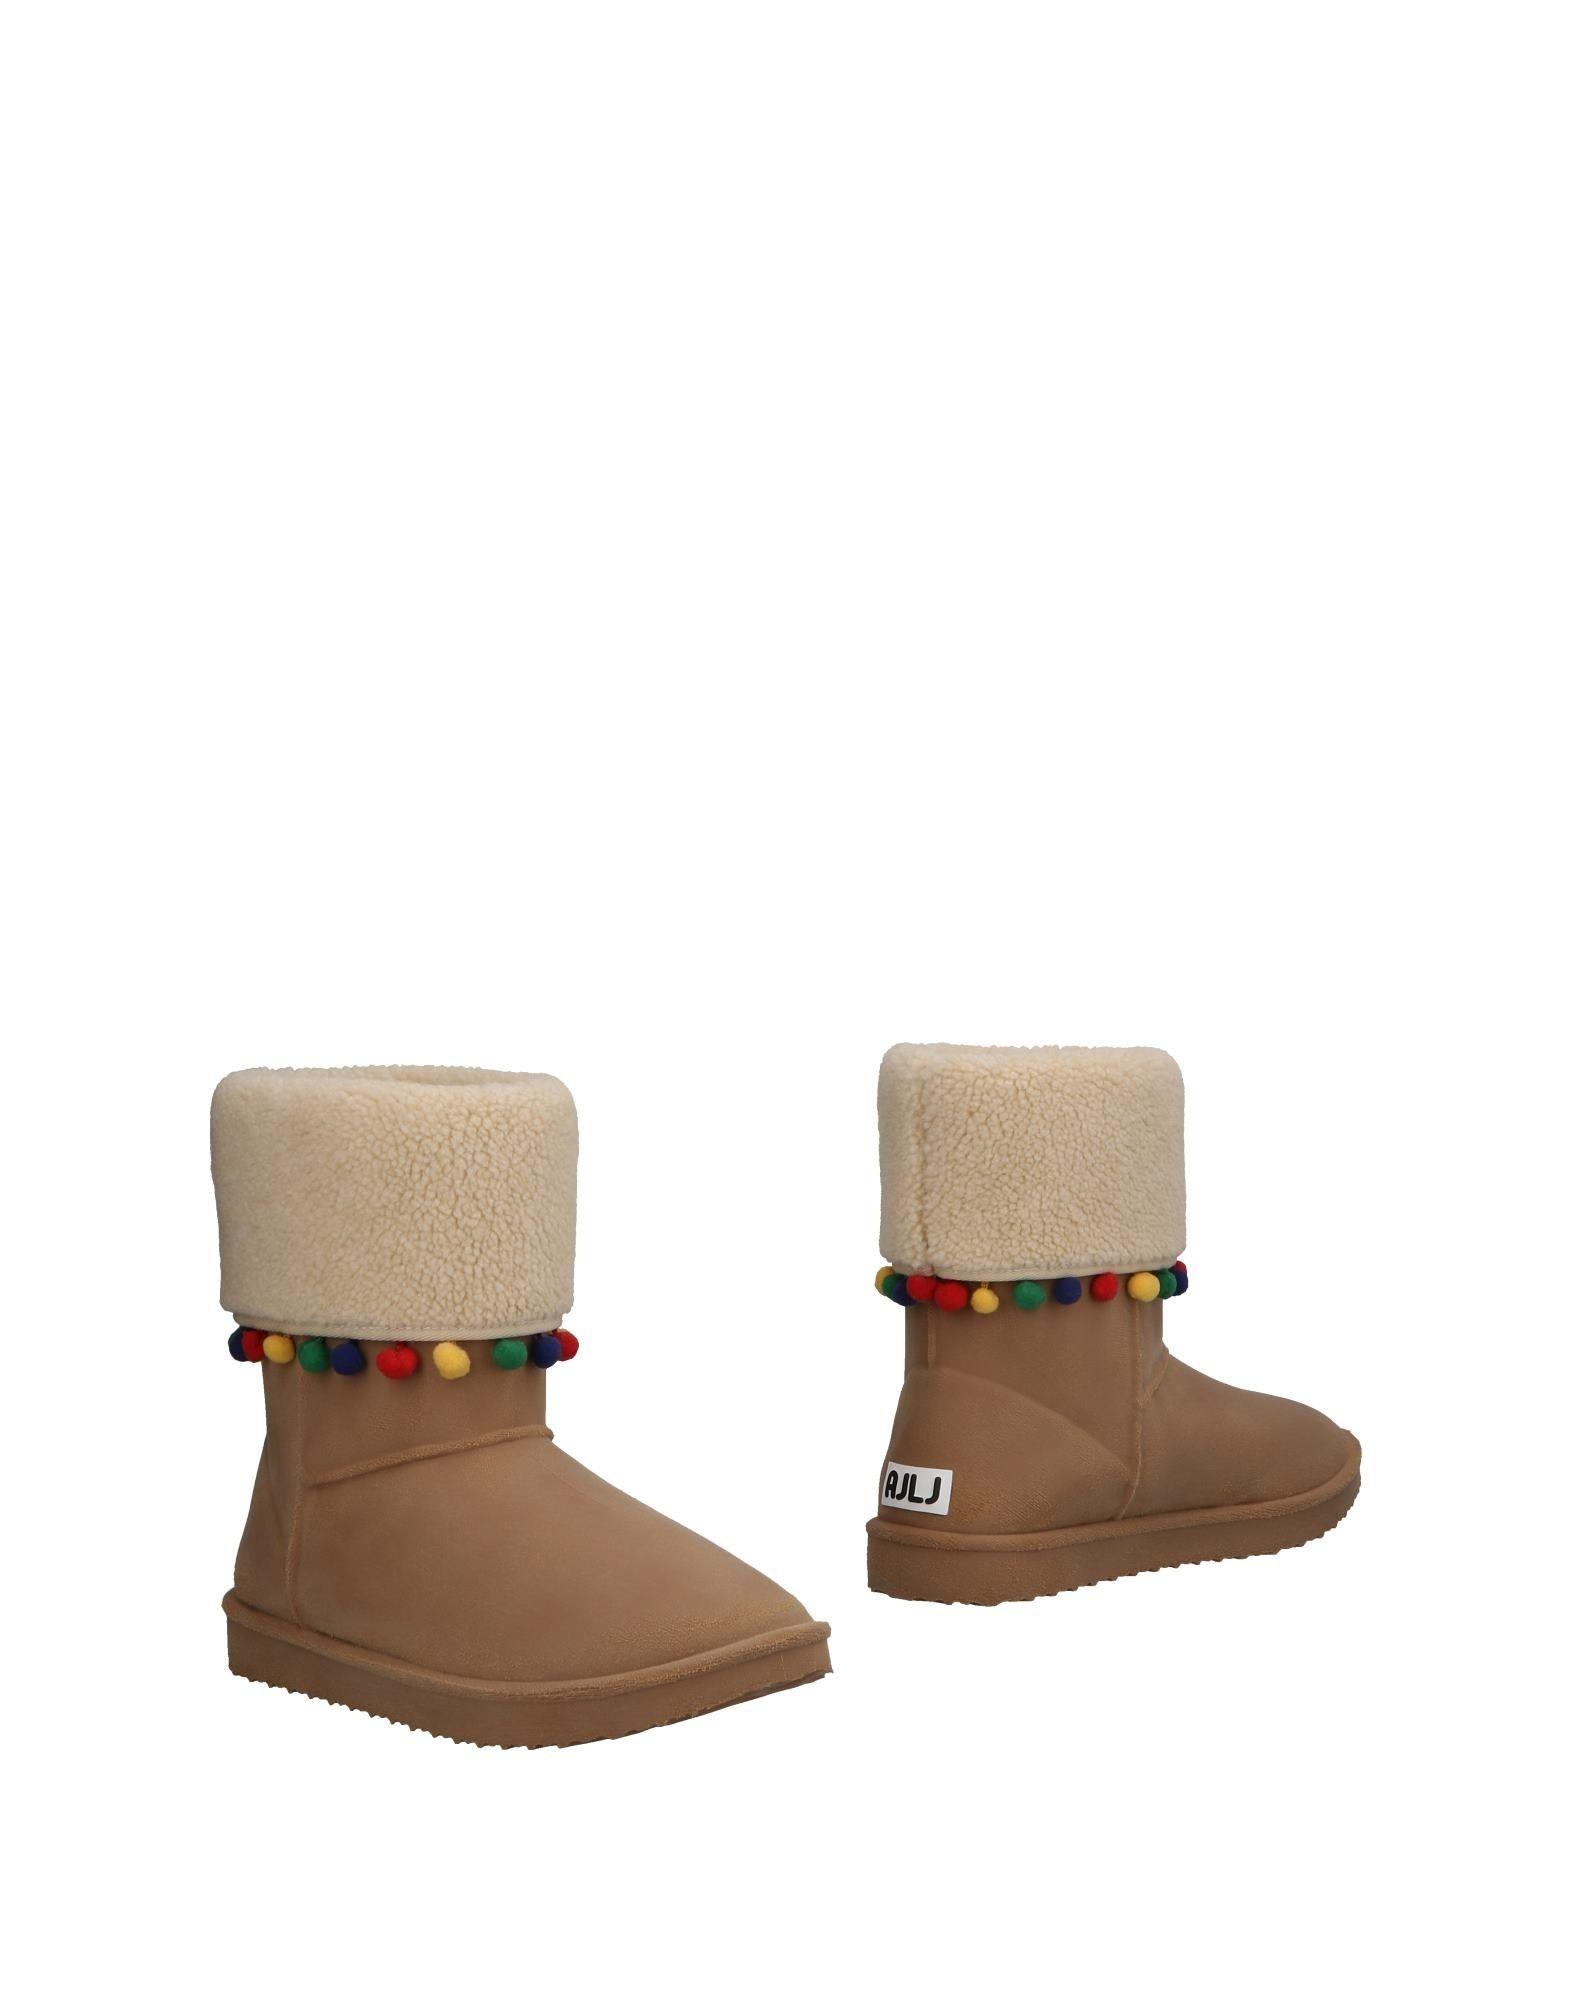 AU JOUR LE JOUR Ankle Boot in Camel